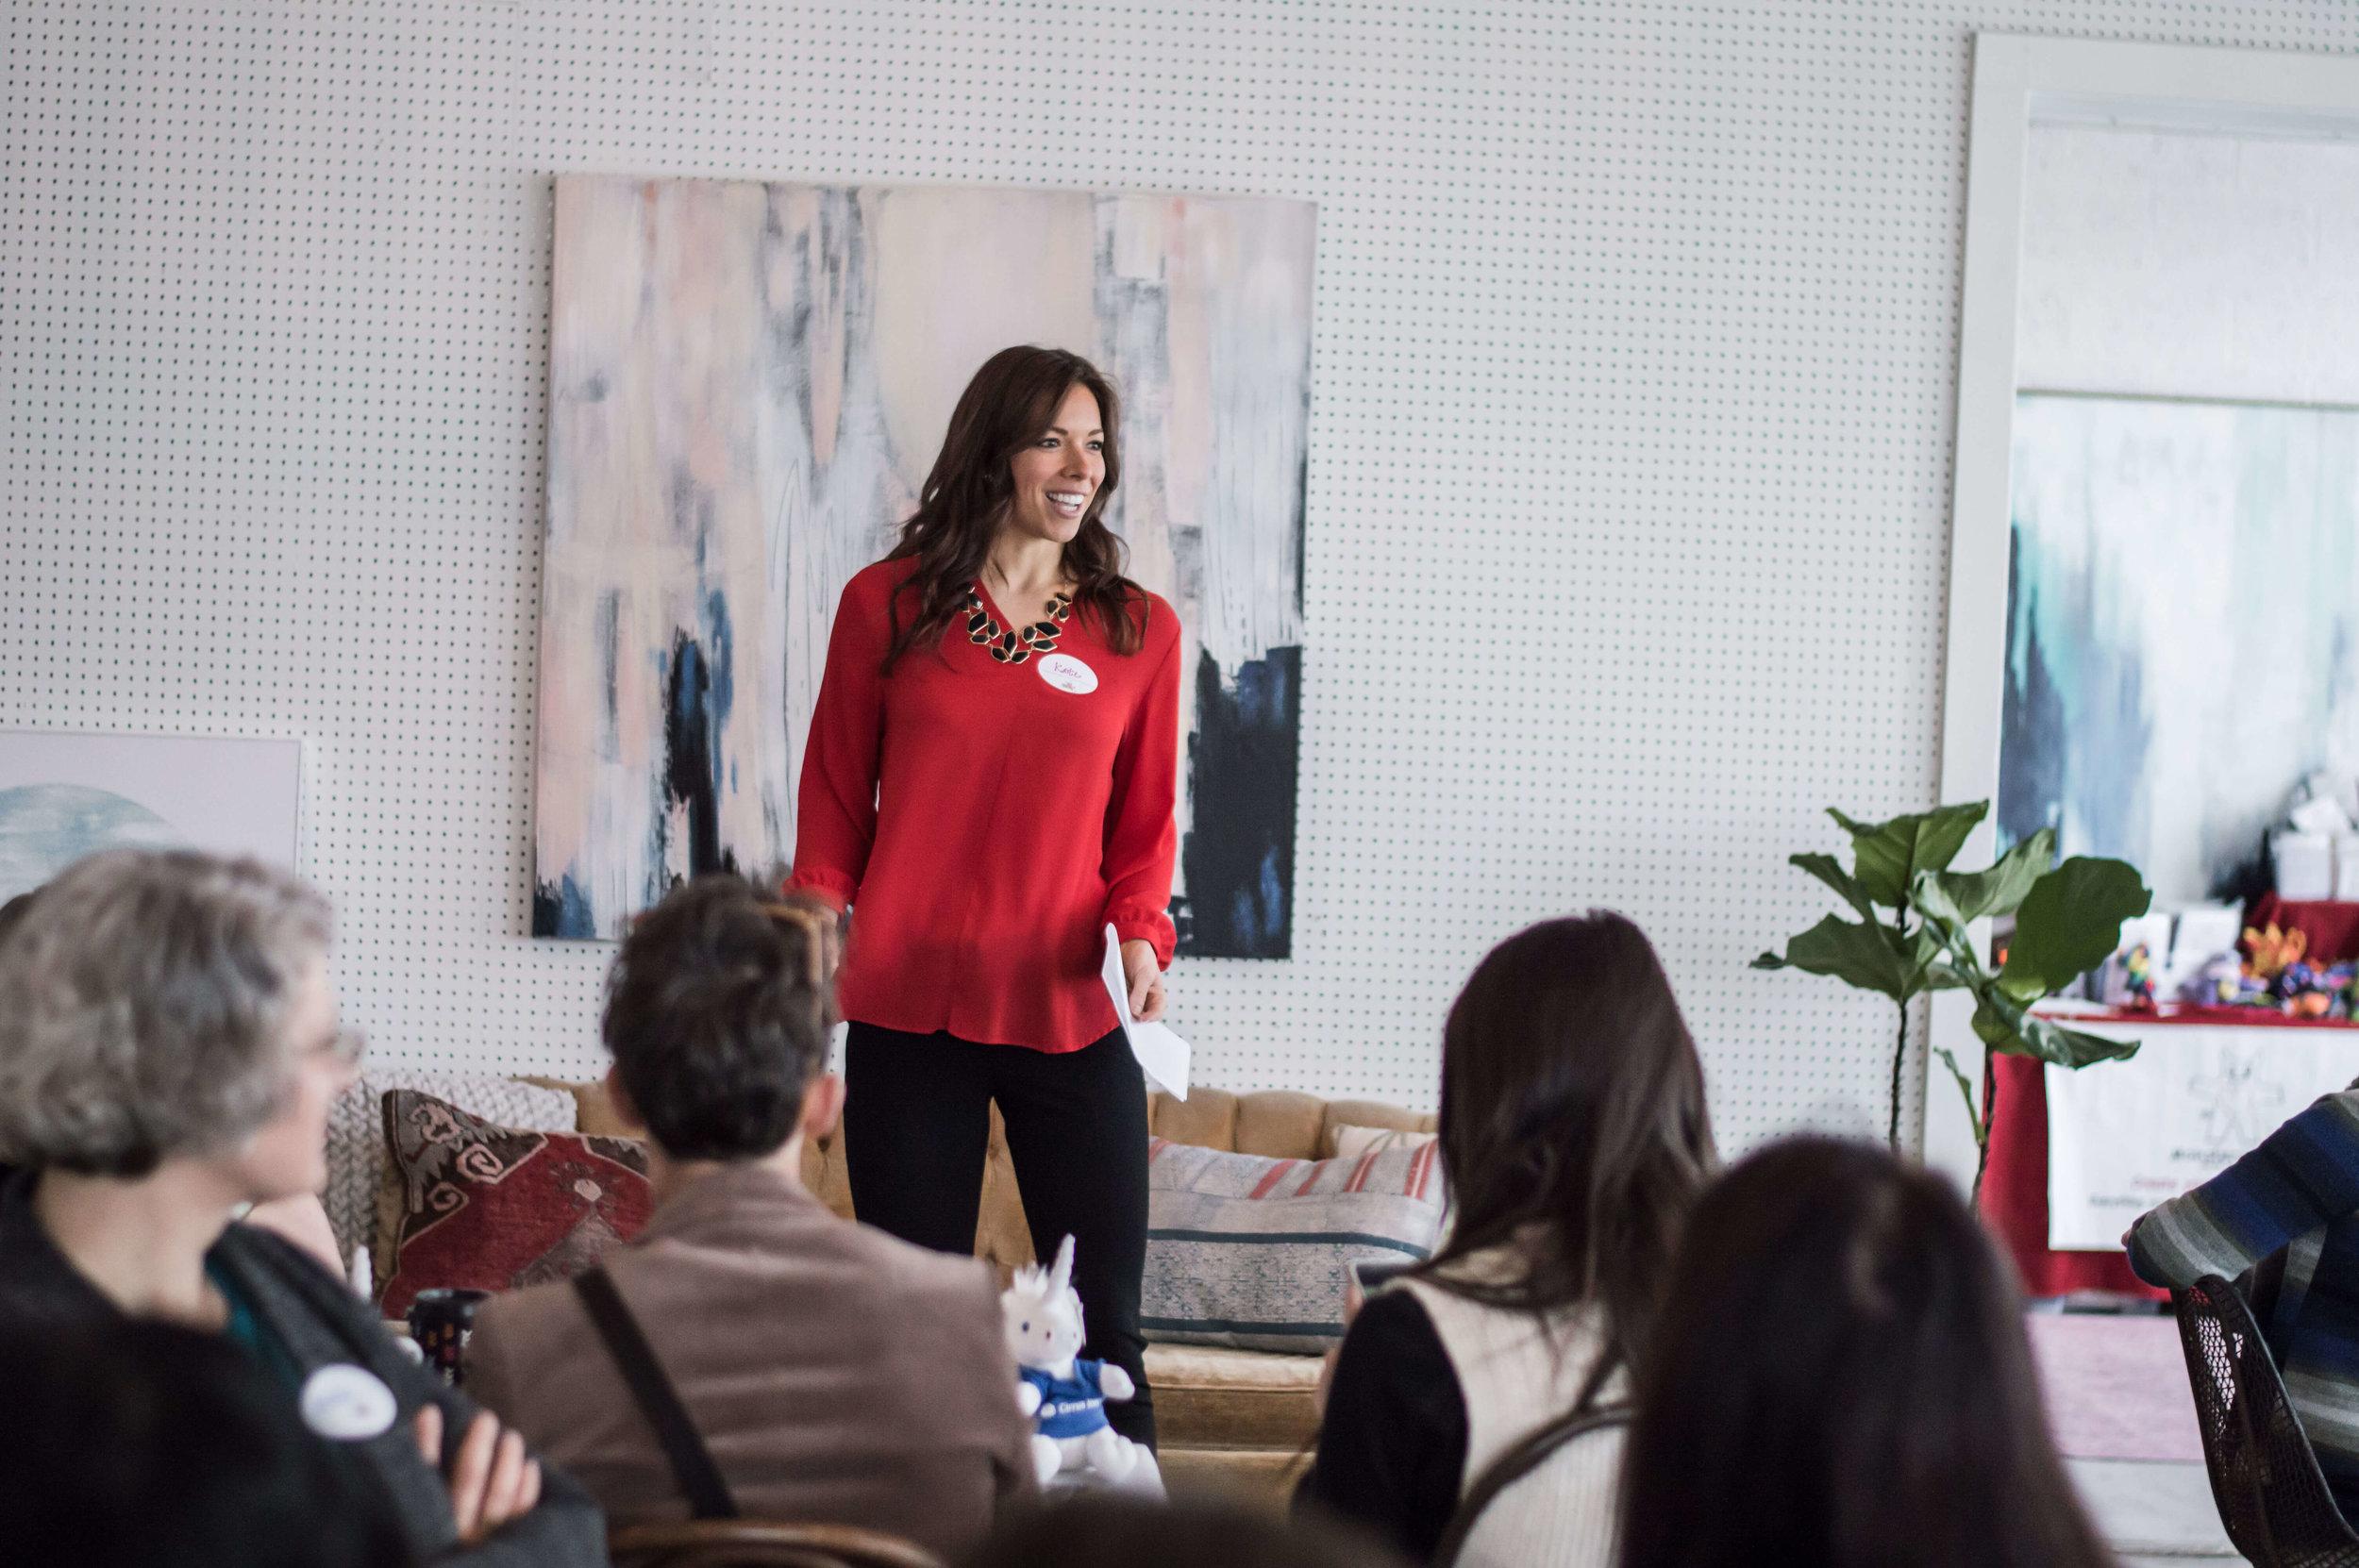 Motivational Speaker, Kate Ziegler — Kate Ziegler